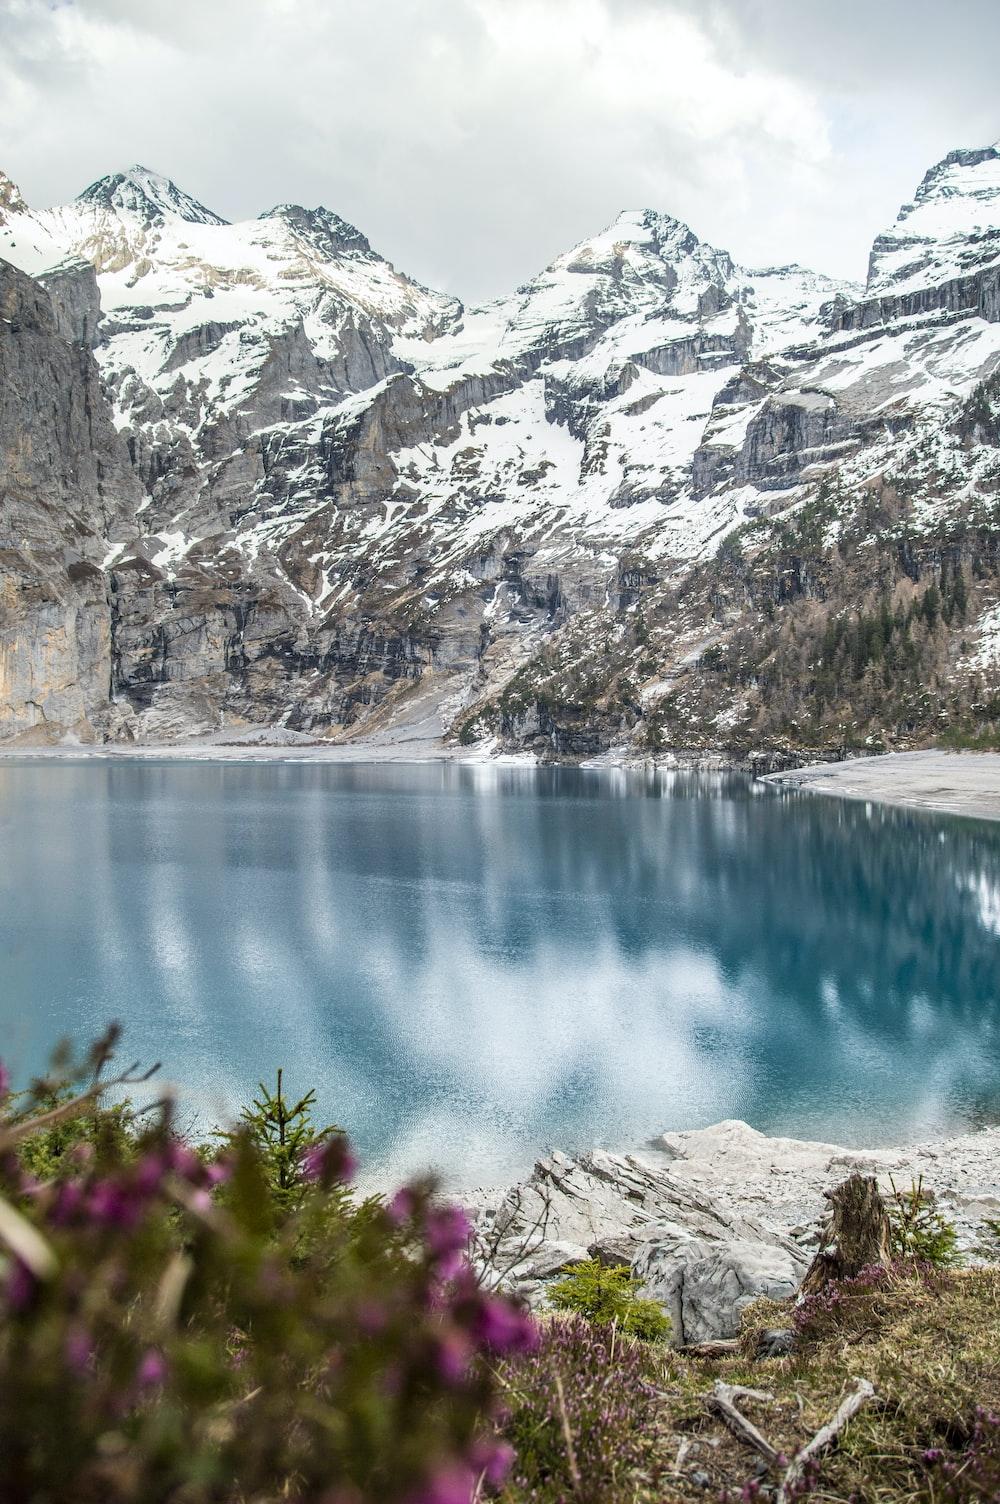 blue lake between gray rocky mountains during daytime